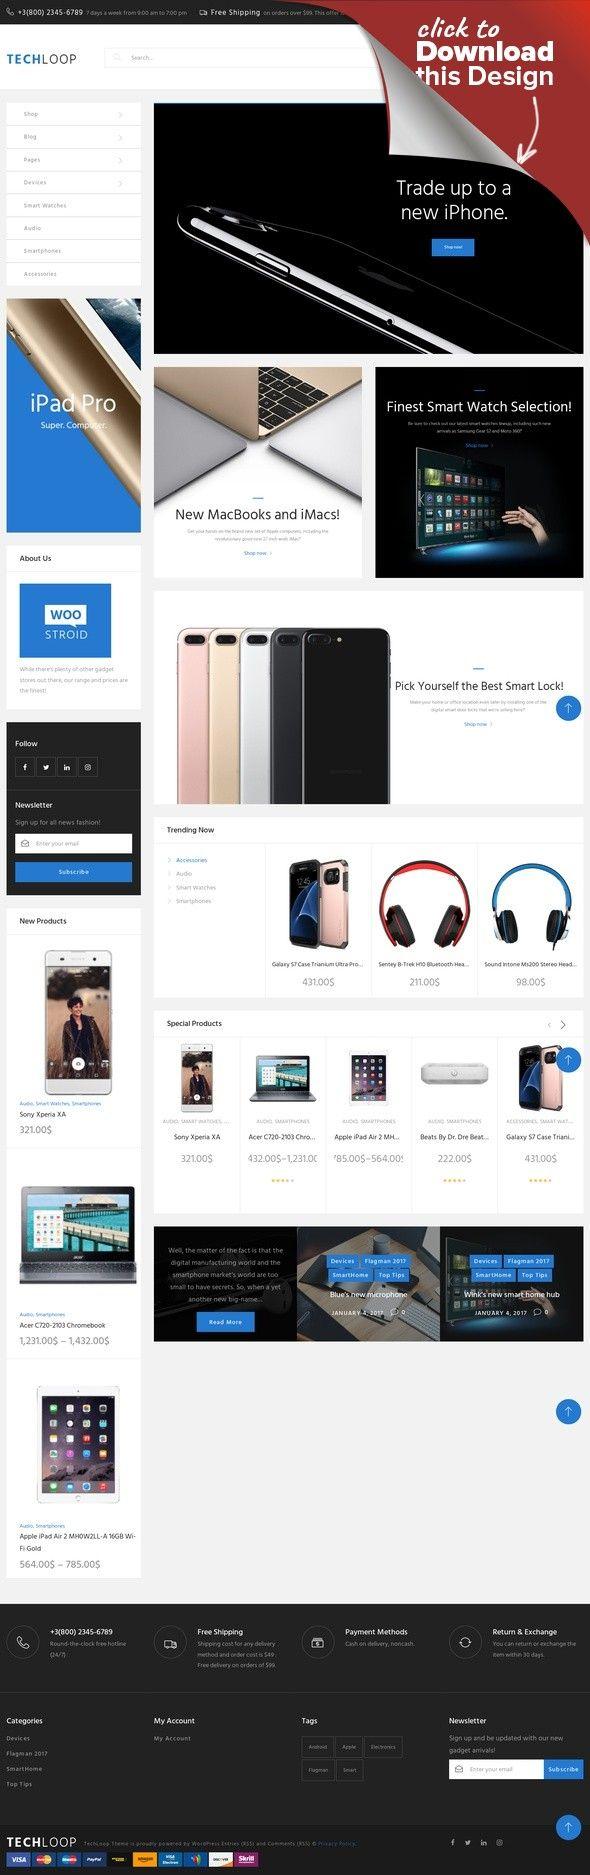 TechLoop - Responsives WooCommerce Theme für Elektronik und Gadgets ...